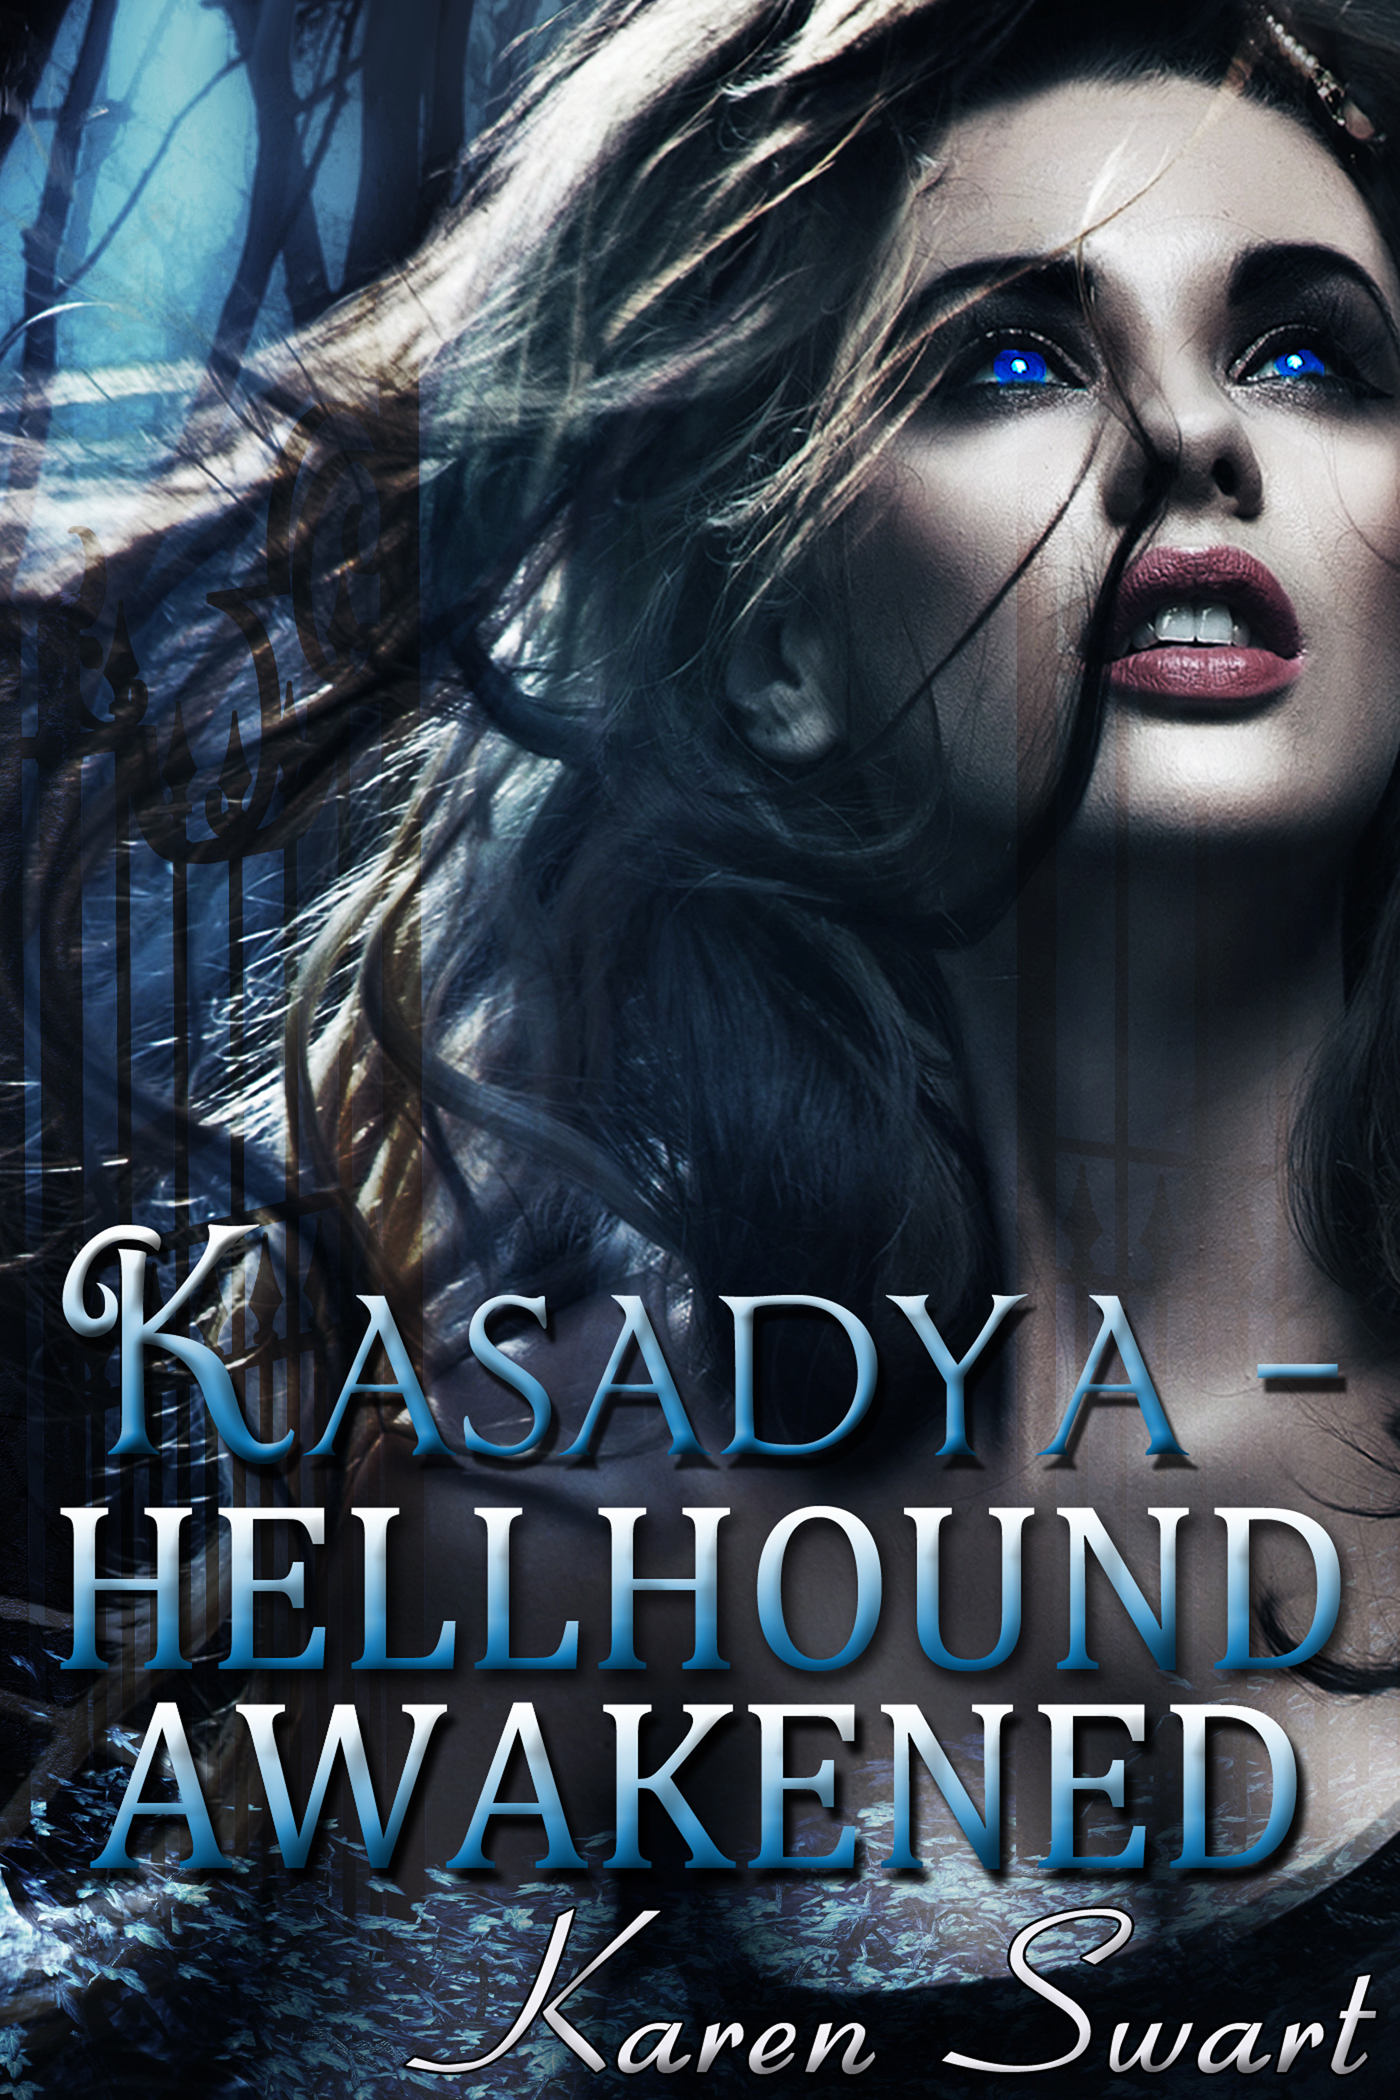 Kasadya (Hellhound Awakened)